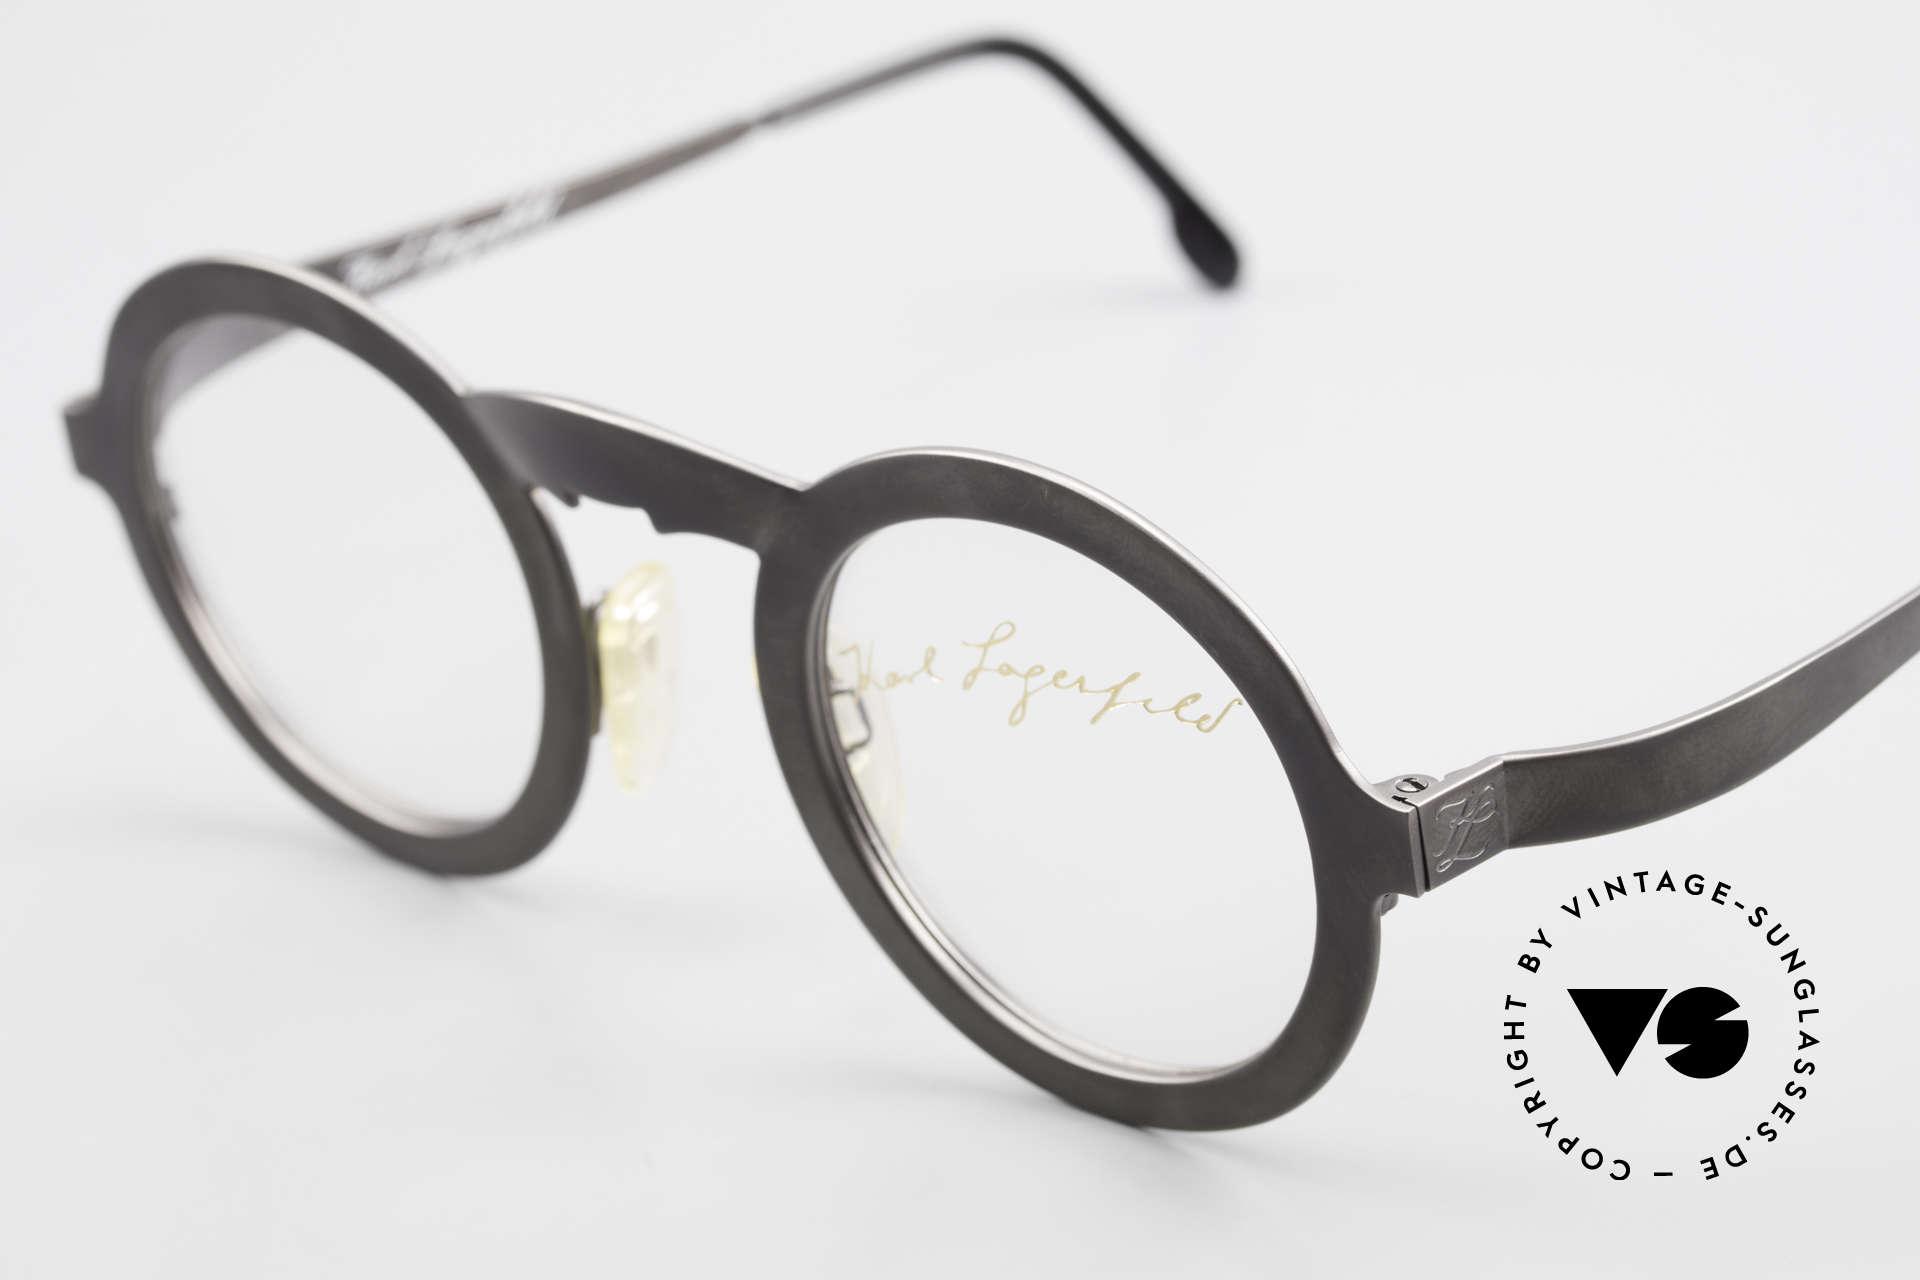 Karl Lagerfeld 4501 Round Panto Designer Frame, distinctive frame design (due to the nose bridge), Made for Men and Women